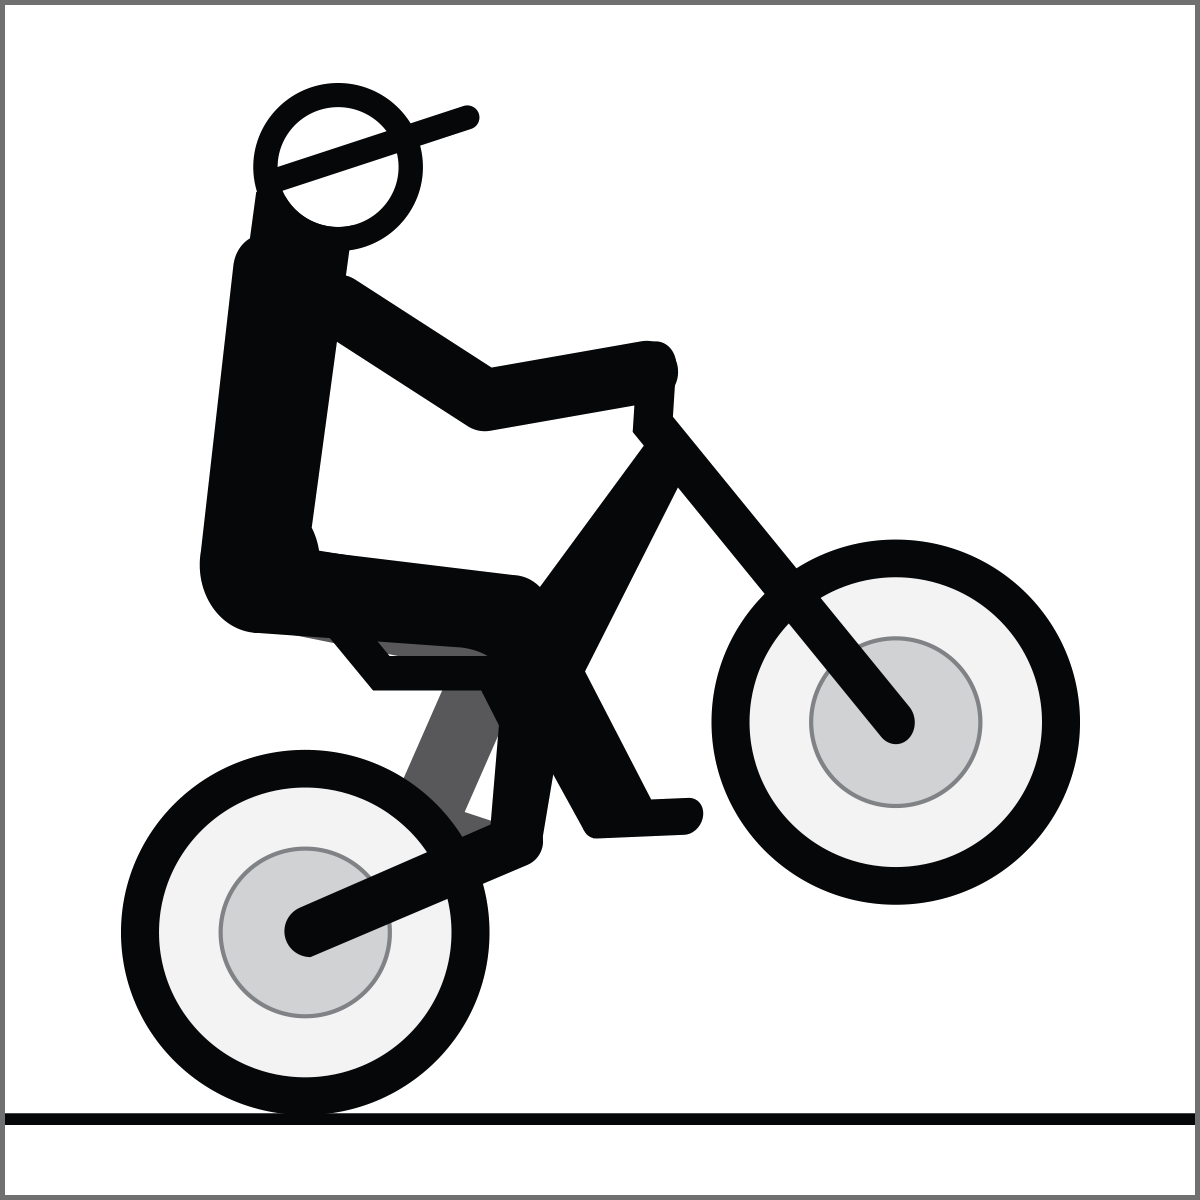 Drawn bike bike riding Race Free  Rider bikes